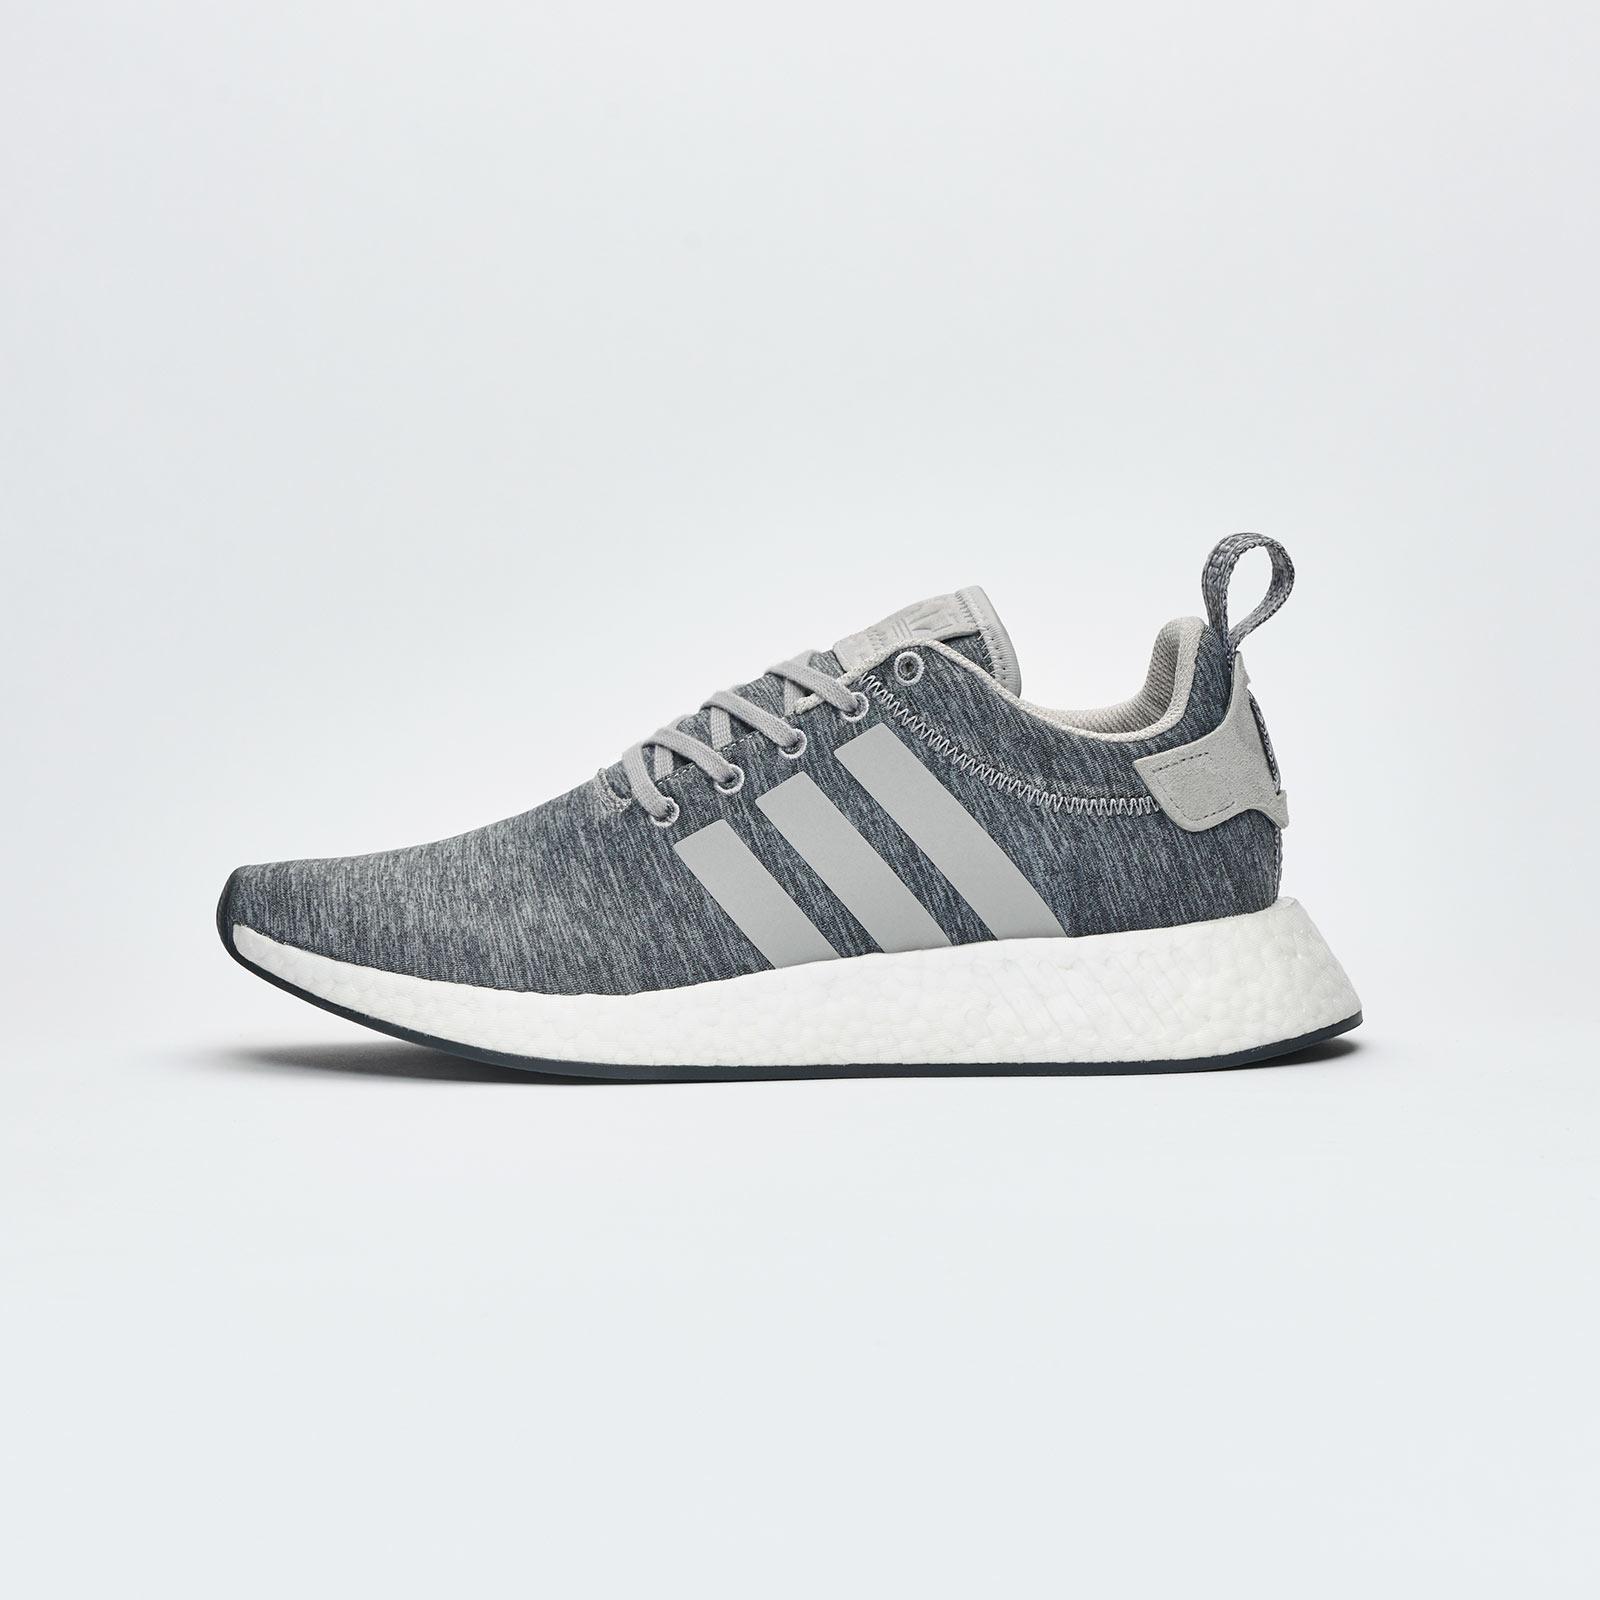 Adidas zapatilla & streetwear by2790 sneakersnstuff NMD R2